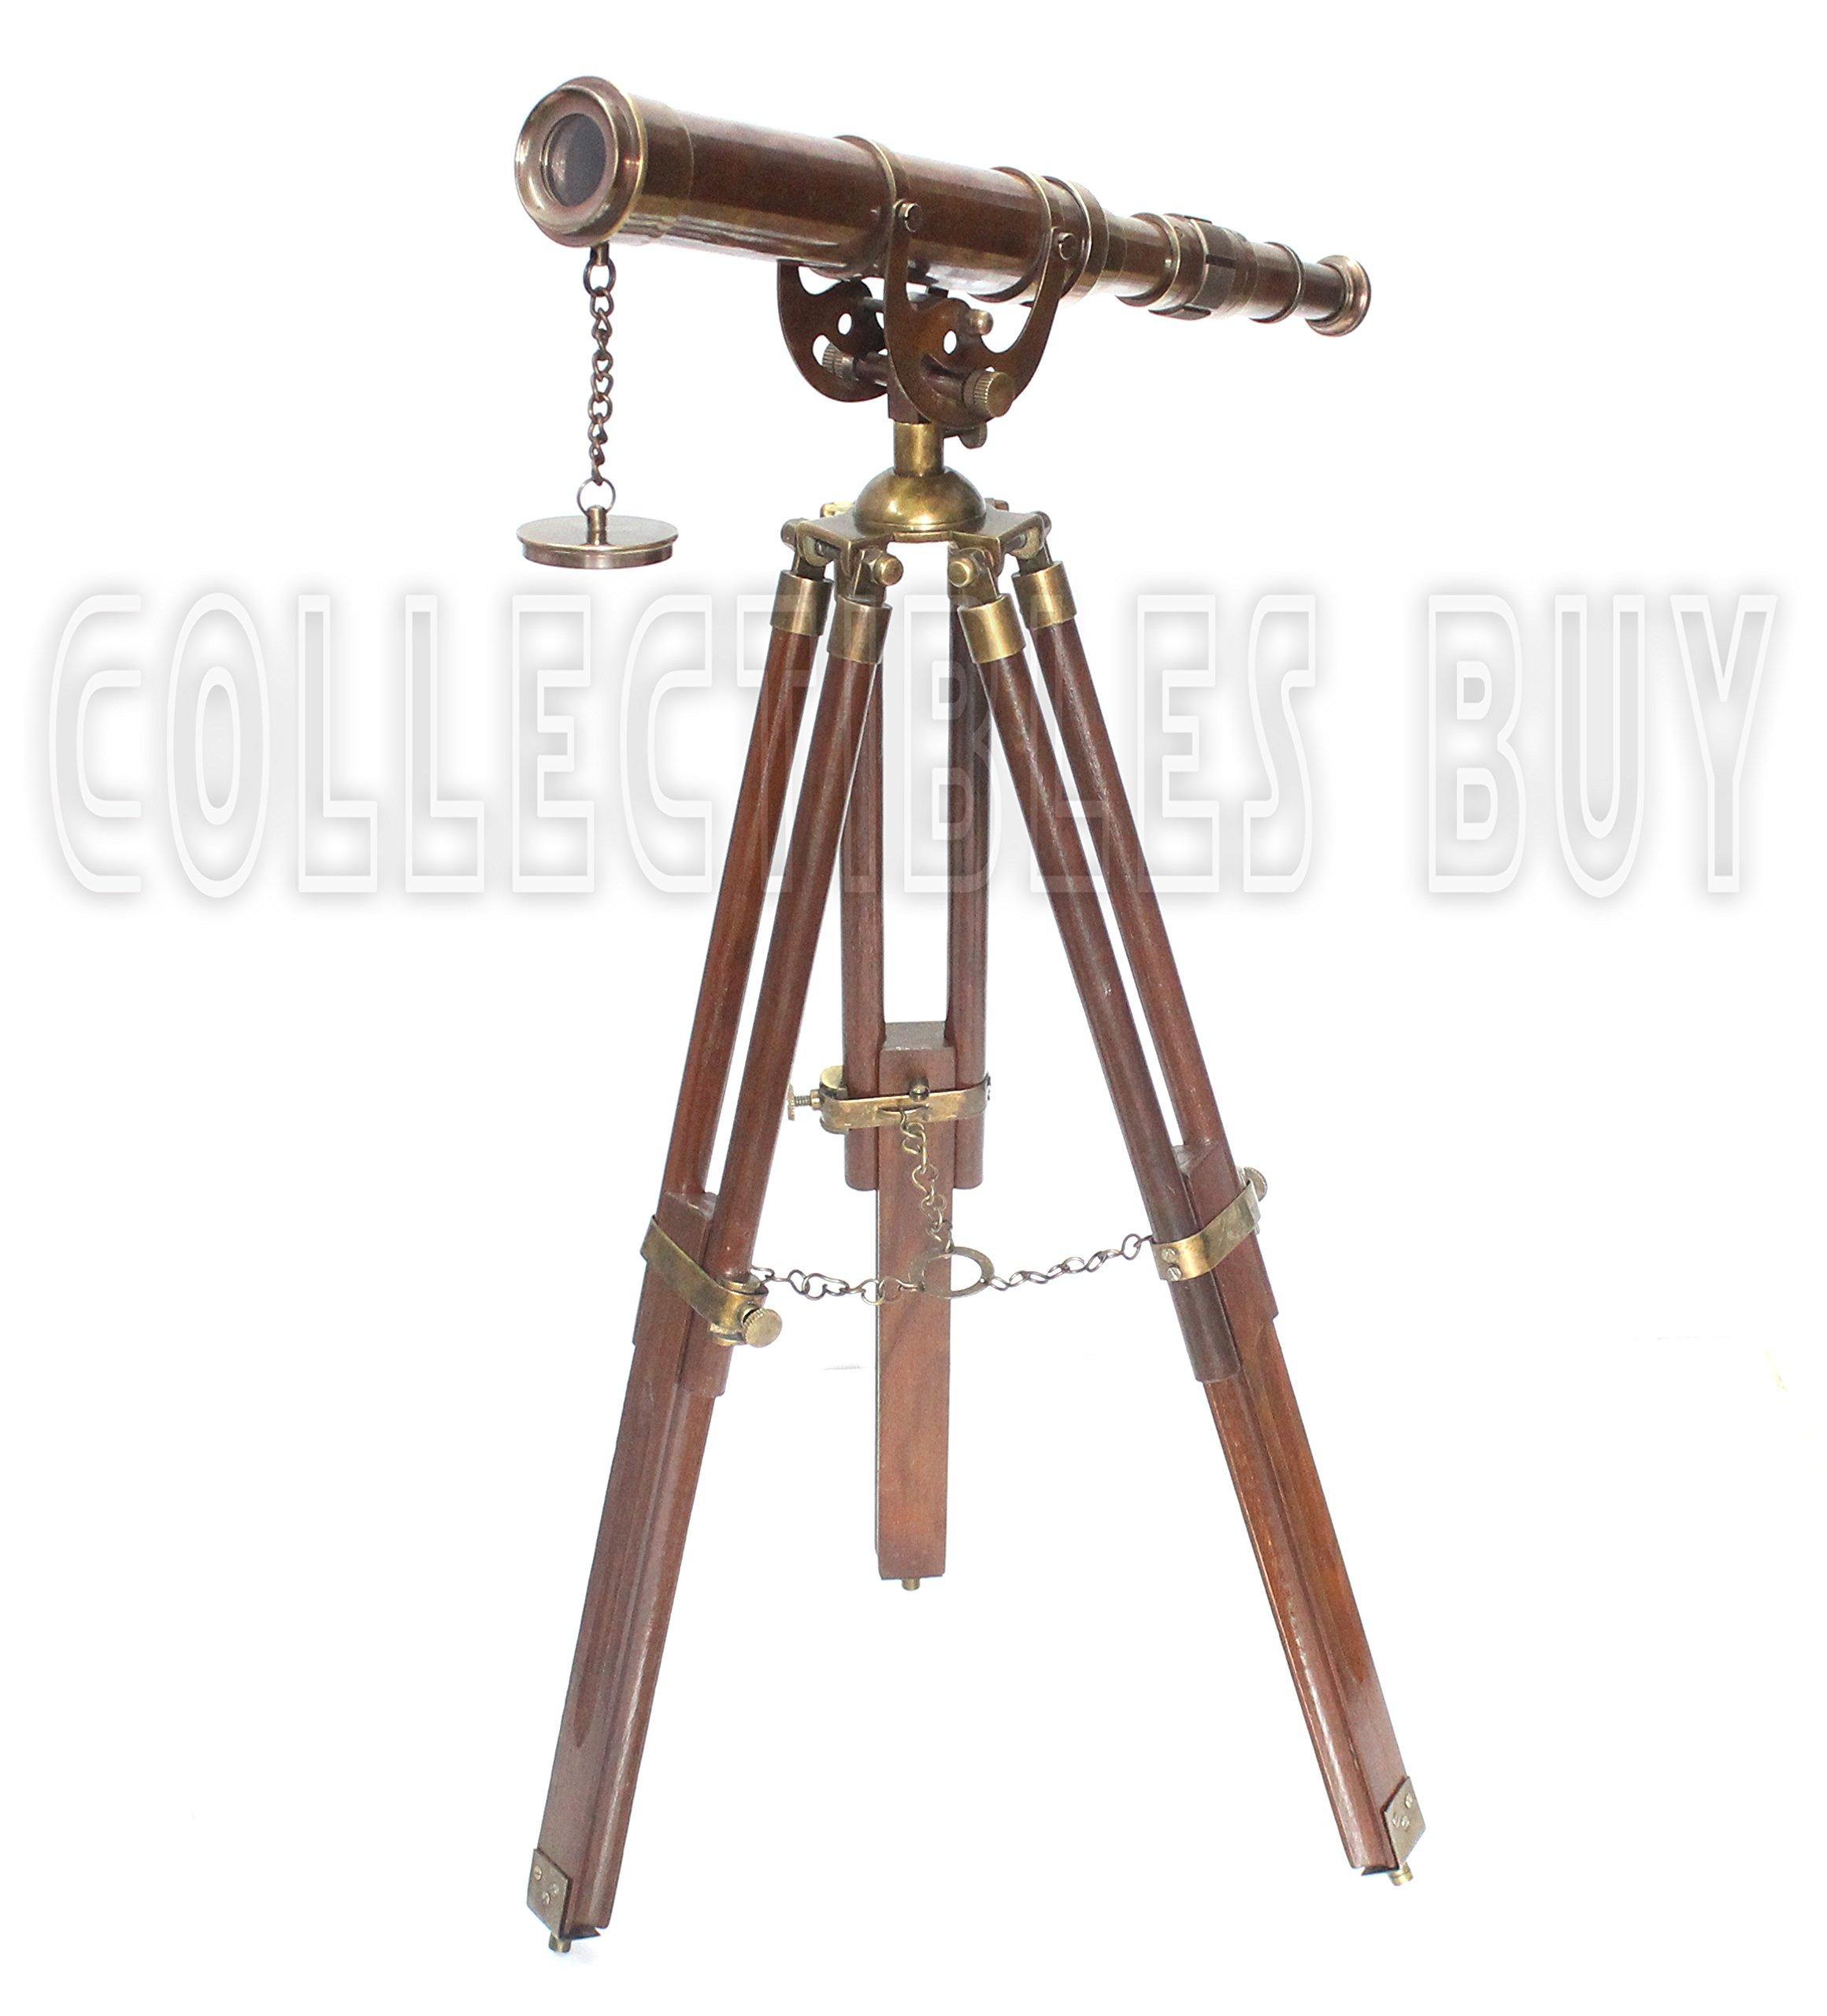 Vintage Antique Tripod Telescope Brass Nautical Telescopes Harbour Master Stand (Antique Finish)